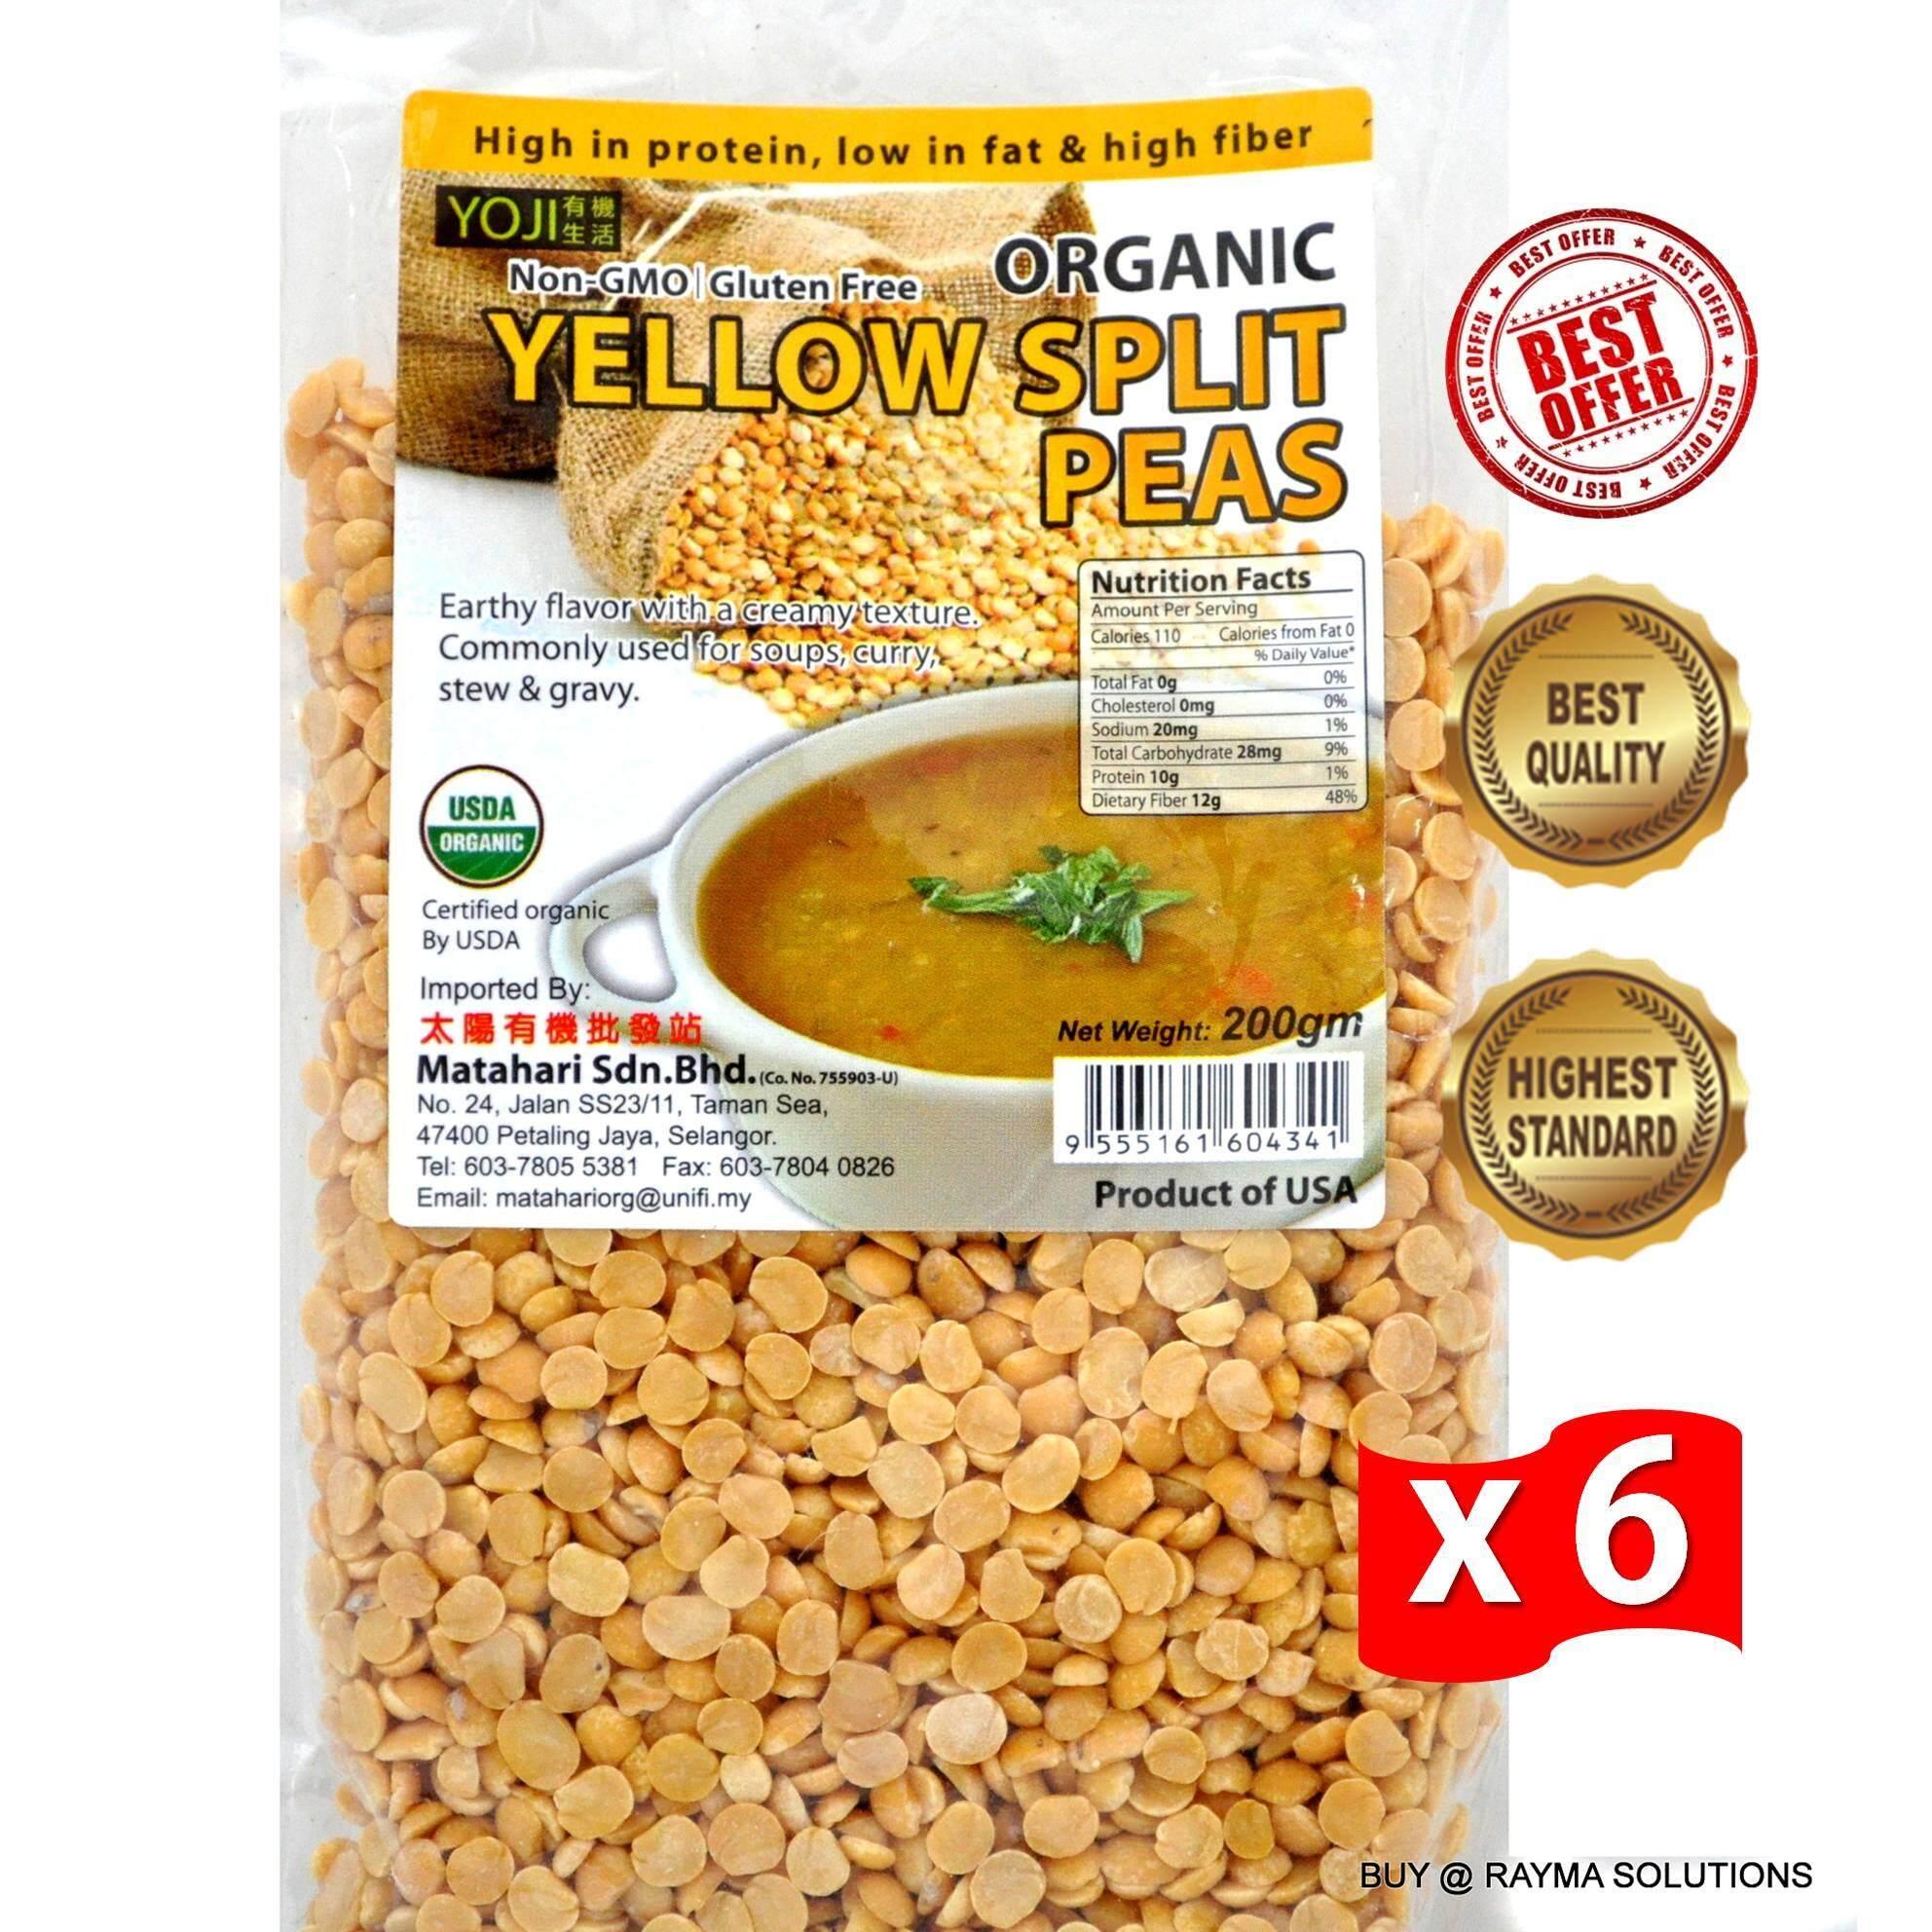 [Best Deal] MH FOOD Organic Yellow Split Peas 200g (6 Packs)